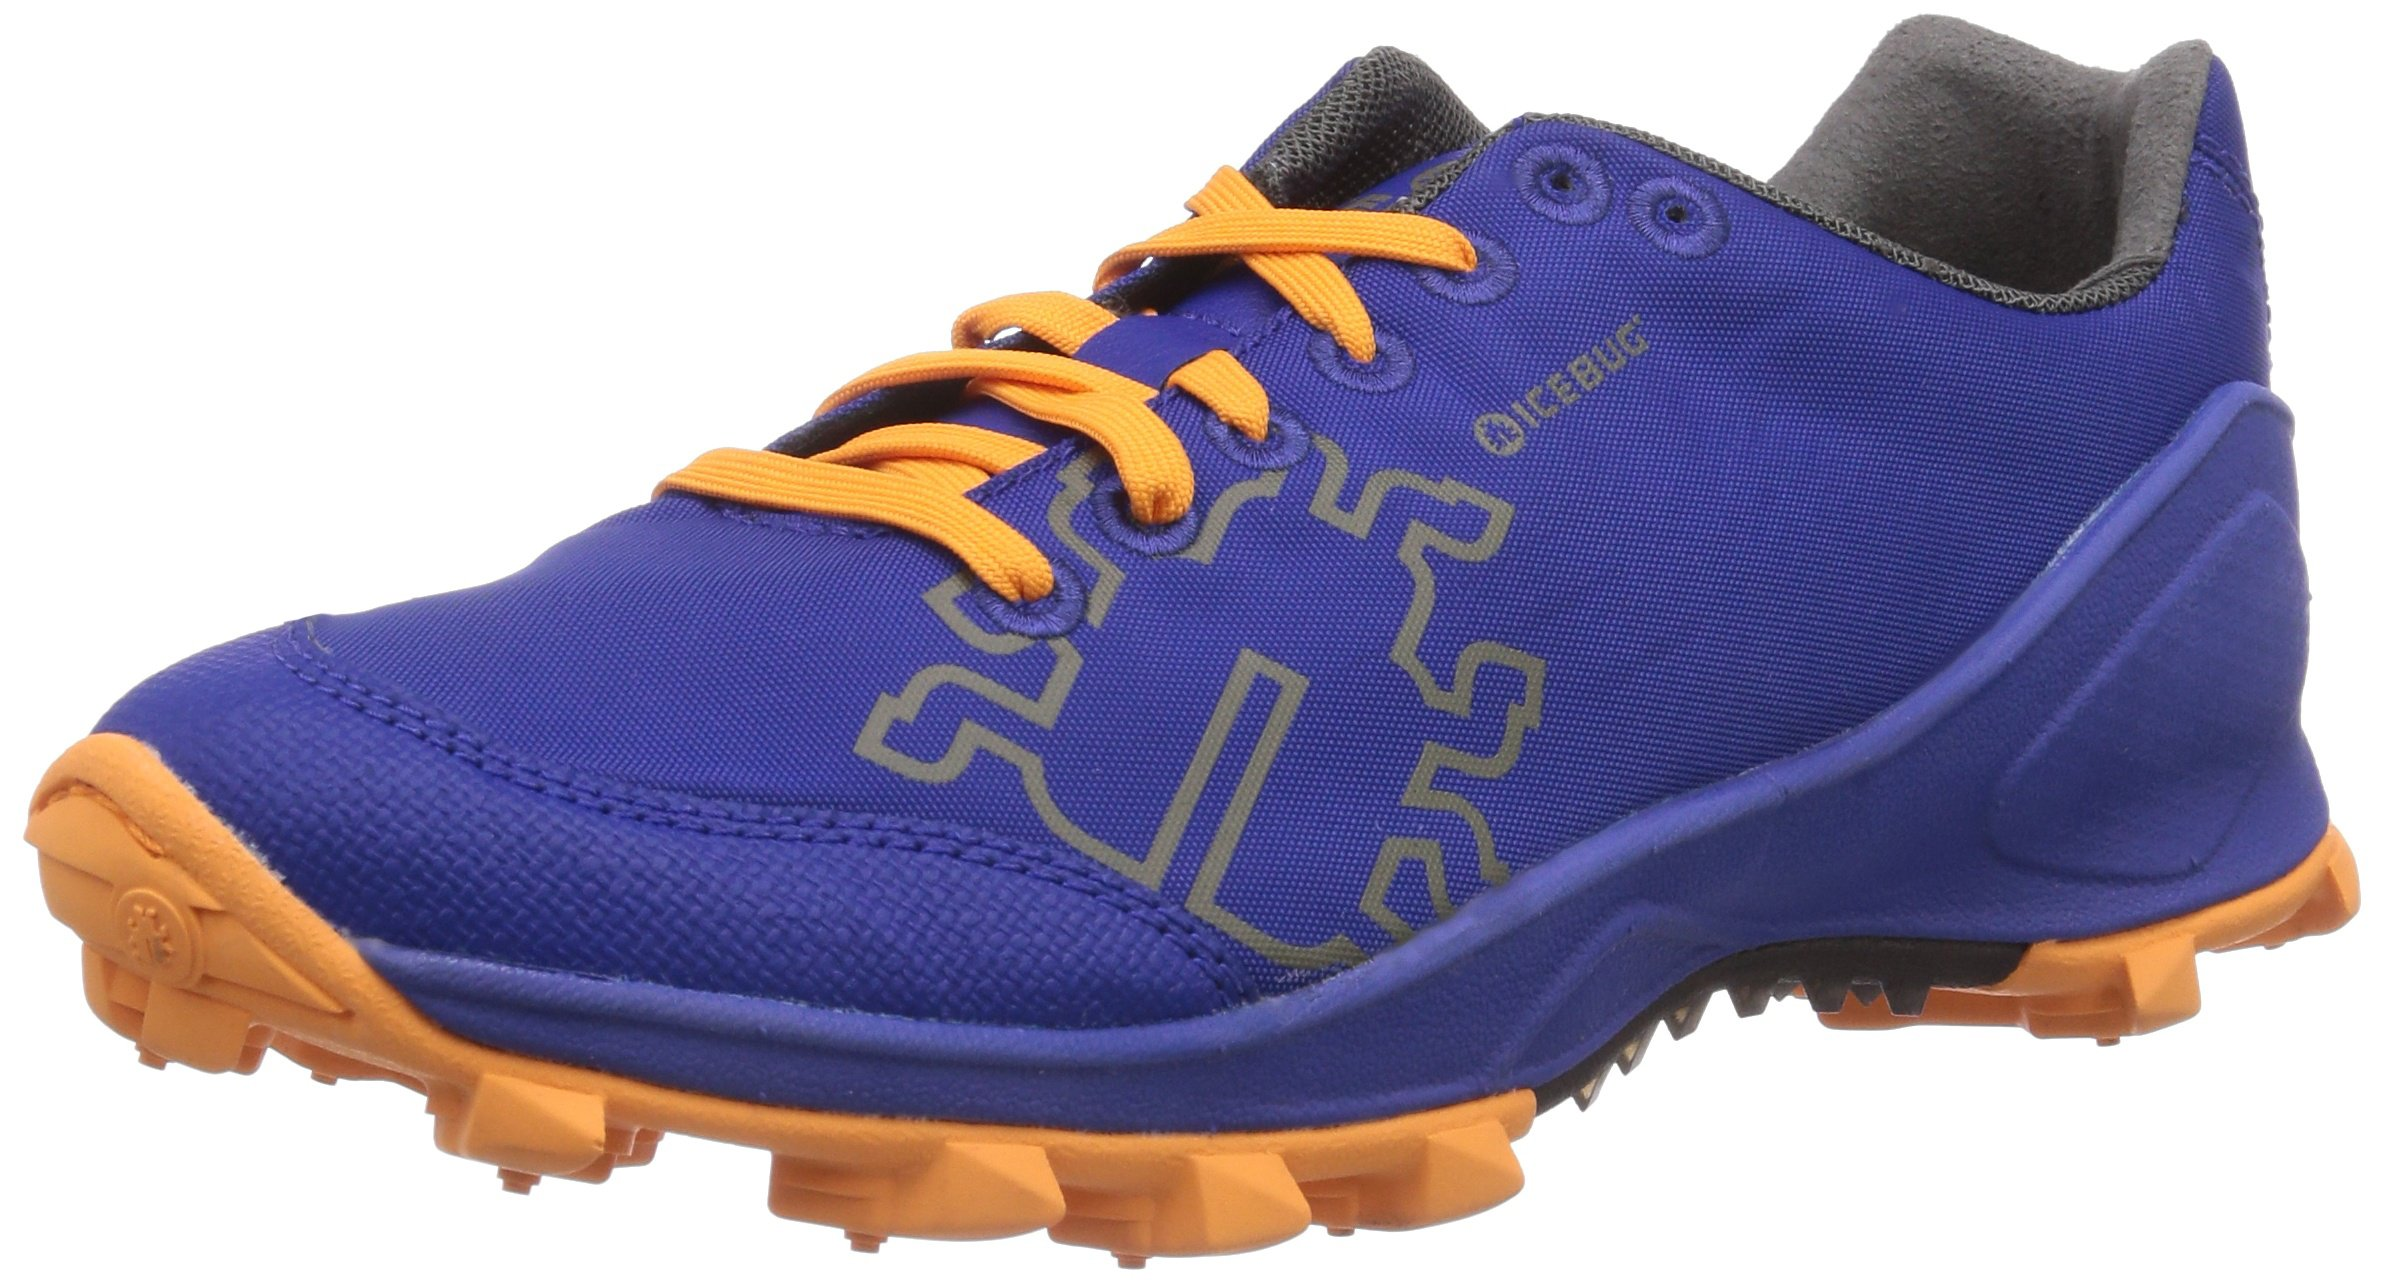 Icebug Women's Zeal RB9X Running Shoe, Lilac/Marigold, 7 M US